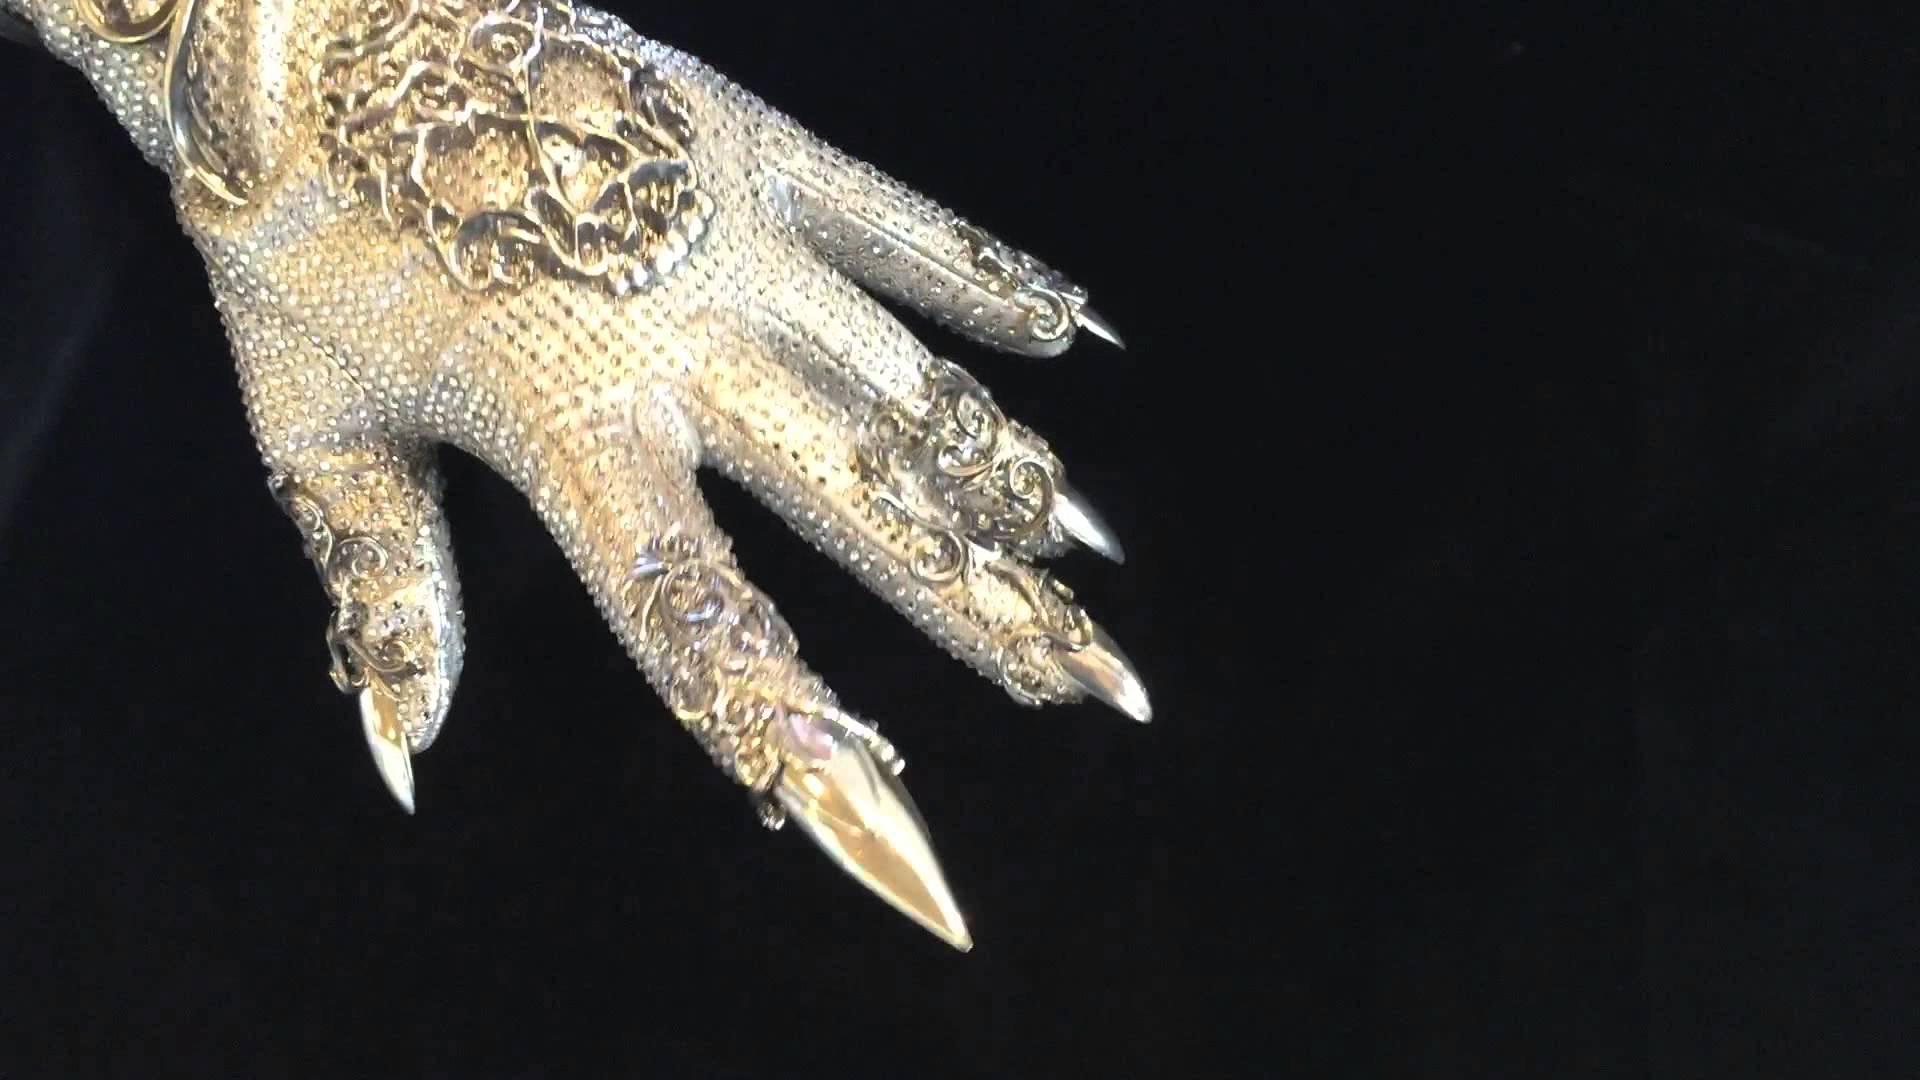 Lady Gaga's Hotel Glove